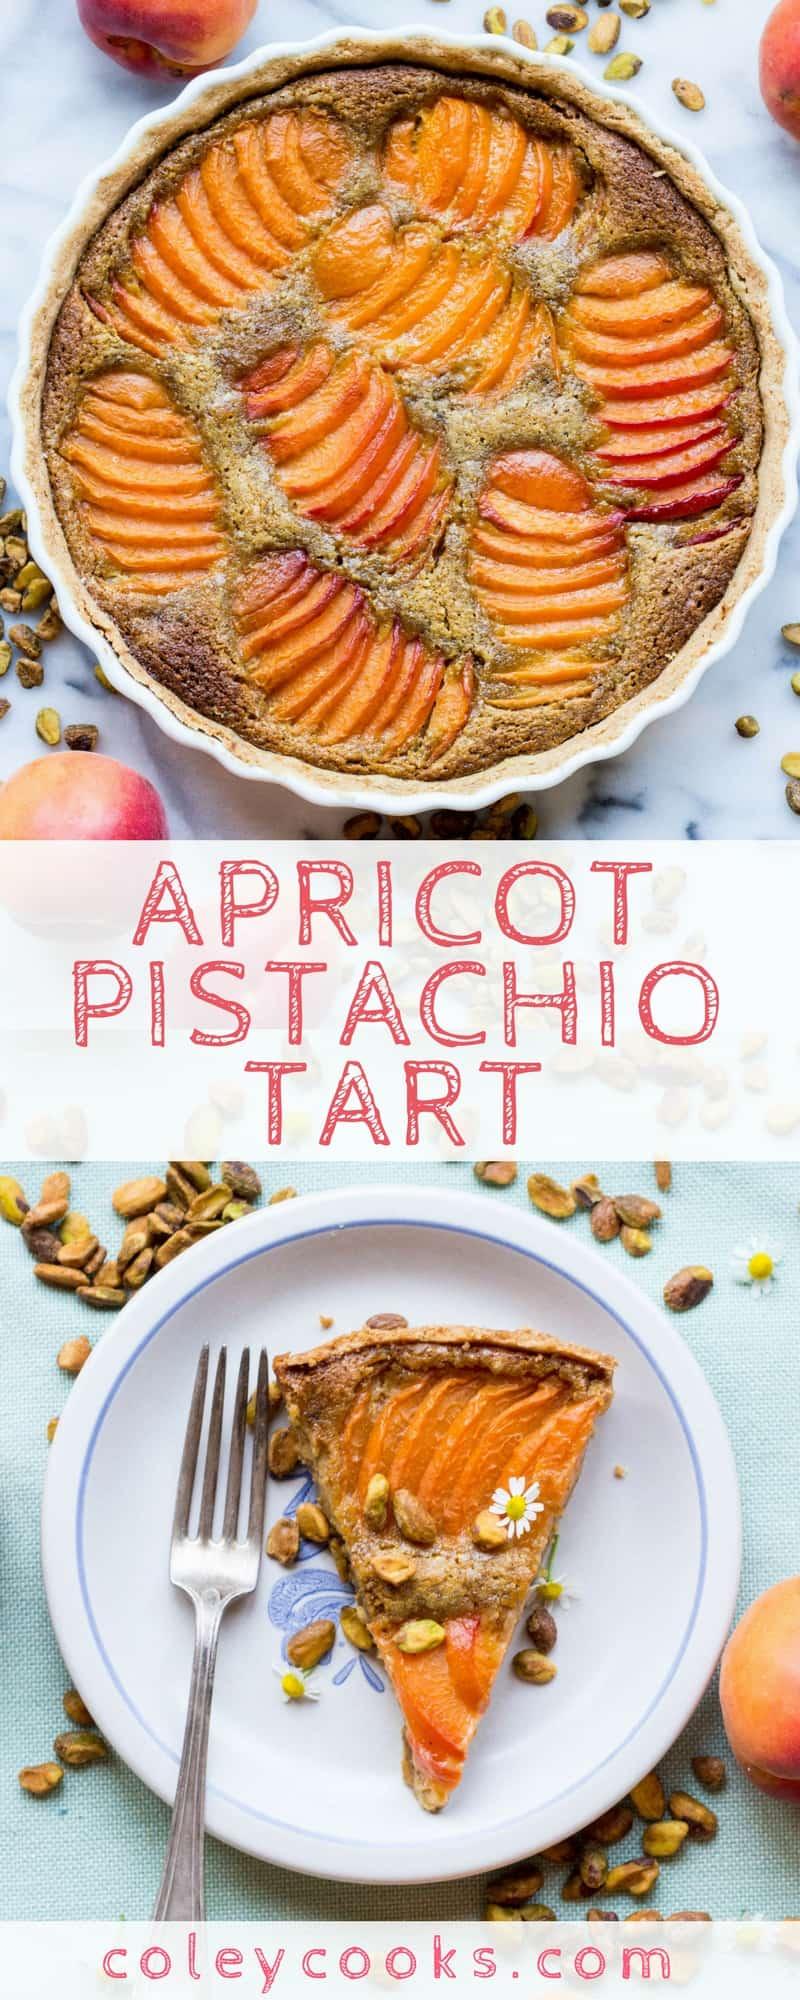 APRICOT PISTACHIO TART | Buttery shortbread crust, pistachio frangipane and juicy fresh apricots. A beautiful, surprisingly easy summer dessert recipe! | ColeyCooks.com